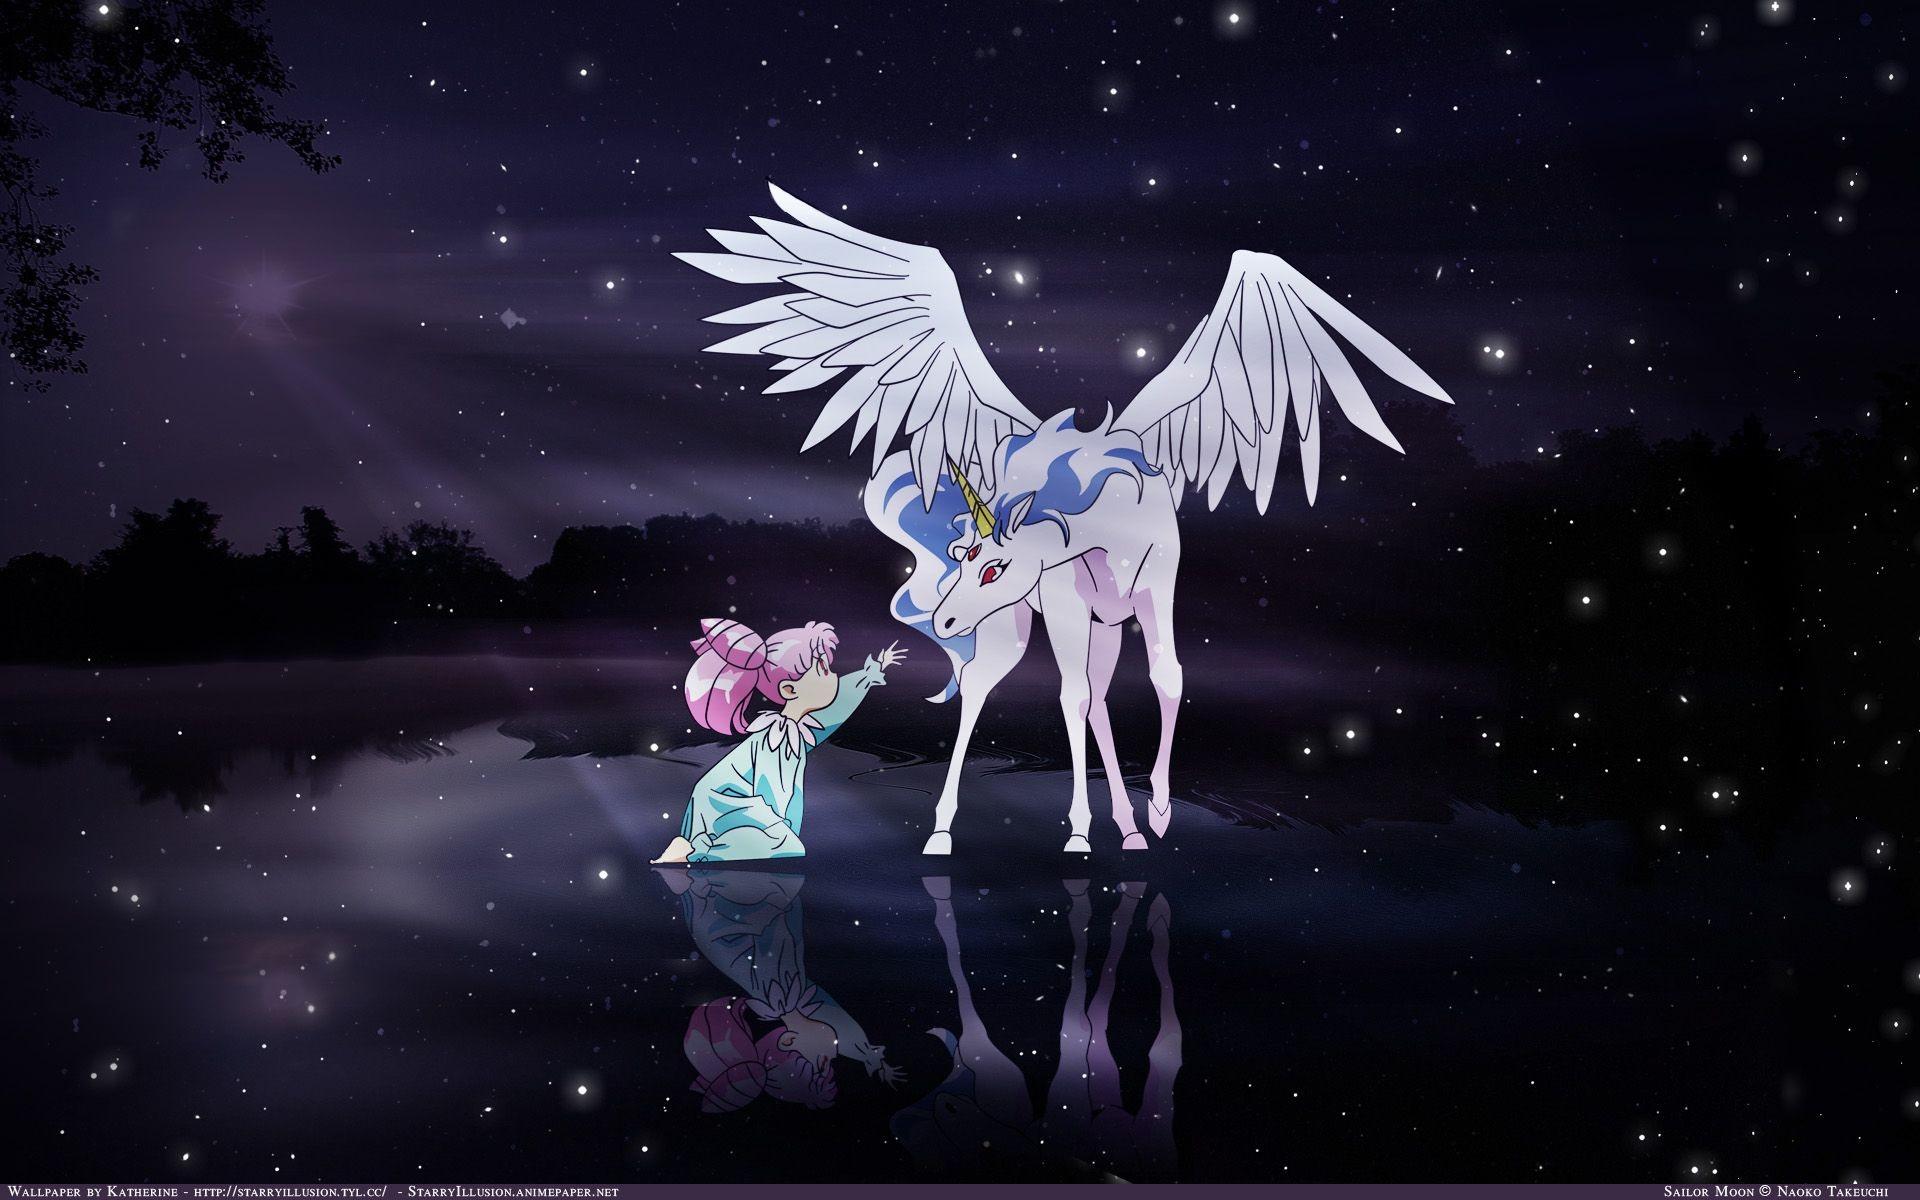 Creative Sailor Moon Wallpapers Hd Desktop Wallpaper 980x734PX .